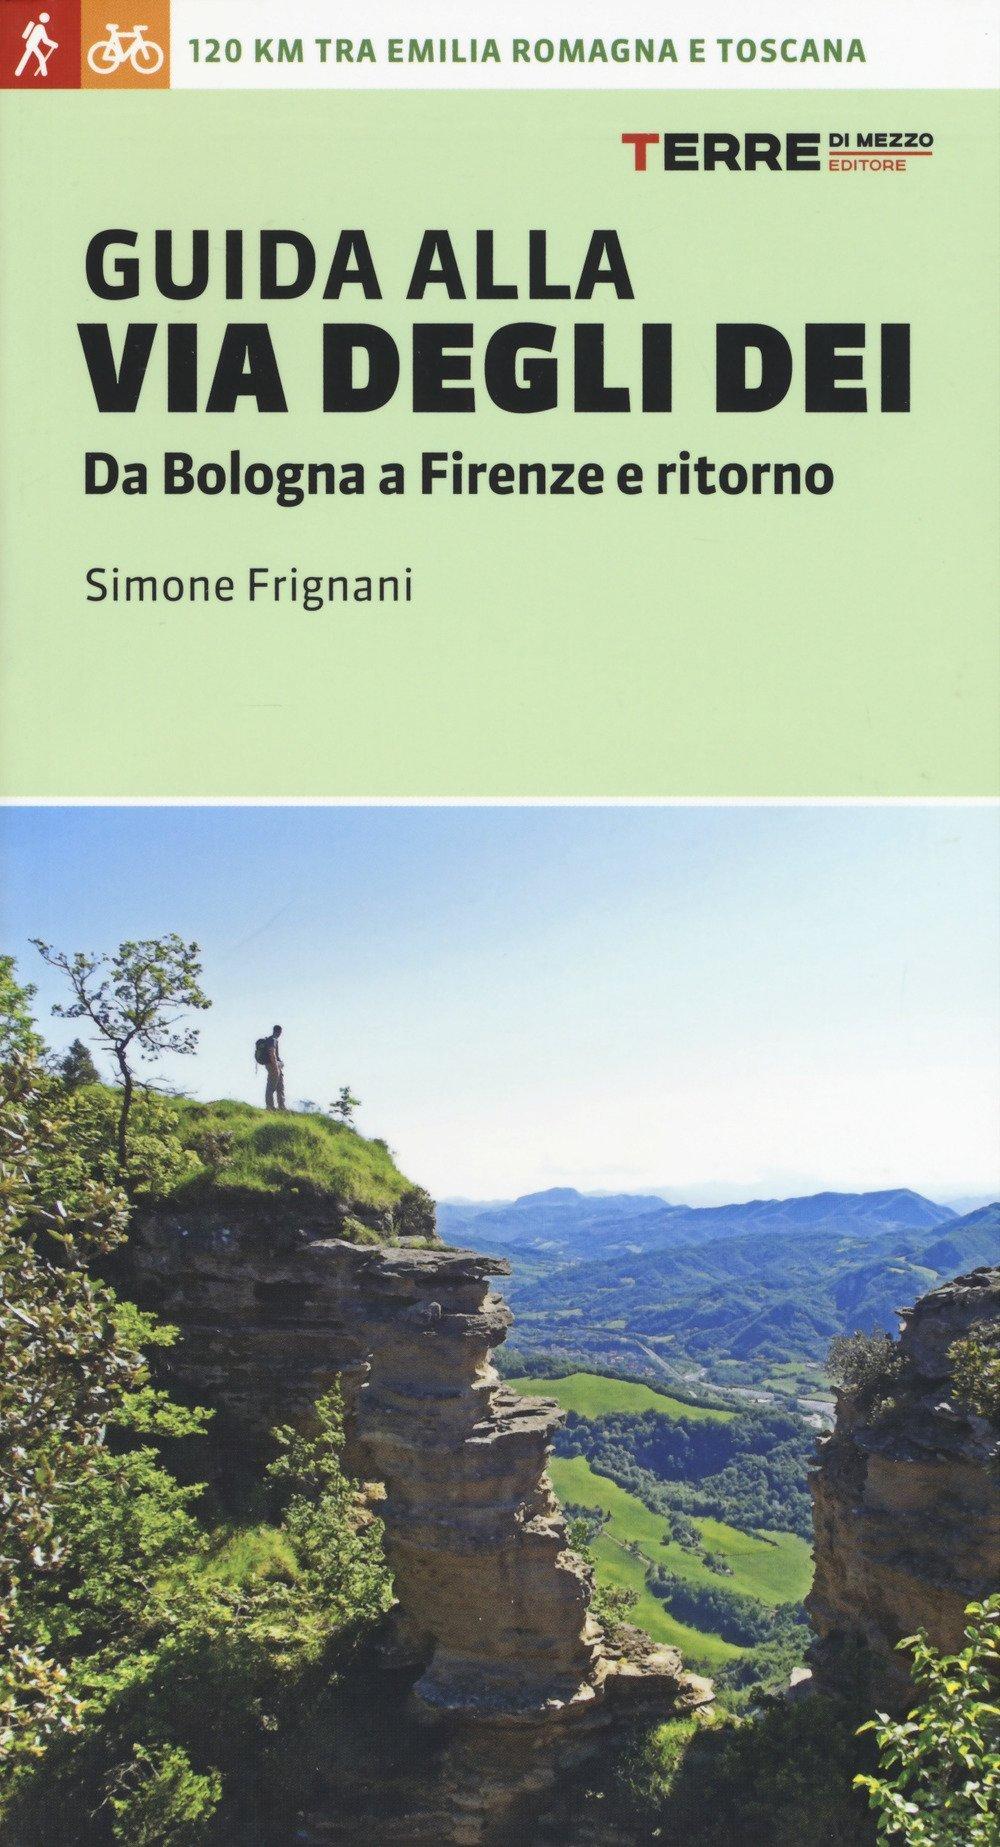 Guida alla Via degli Dei 9788861894600 Simone Frignani Terre di Mezzo   Lopen naar Rome, Meerdaagse wandelroutes, Wandelgidsen Italië